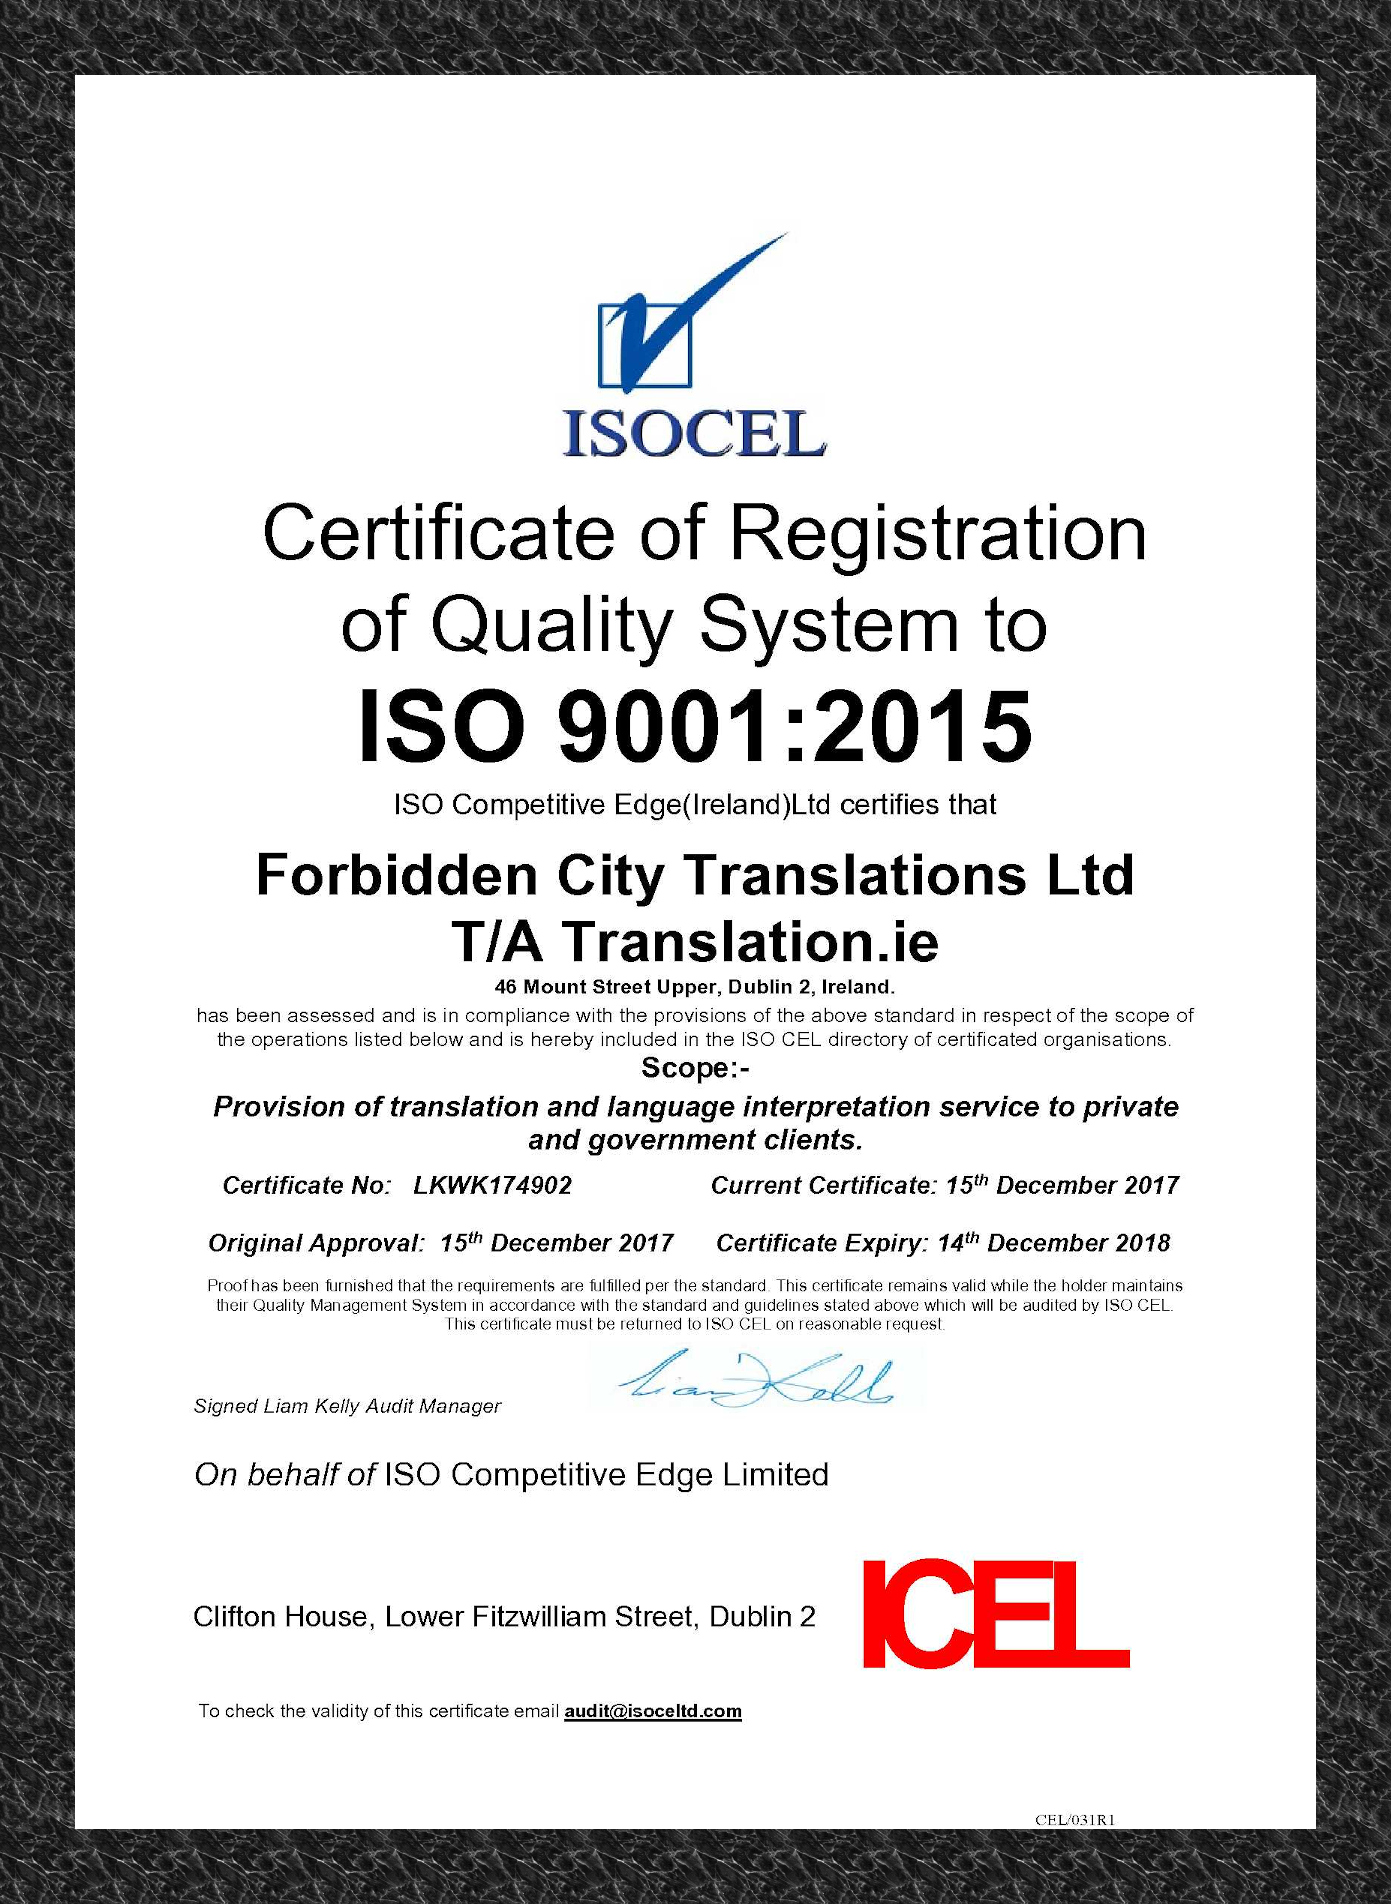 Translation.ie ISO 9001:2015 Certificate